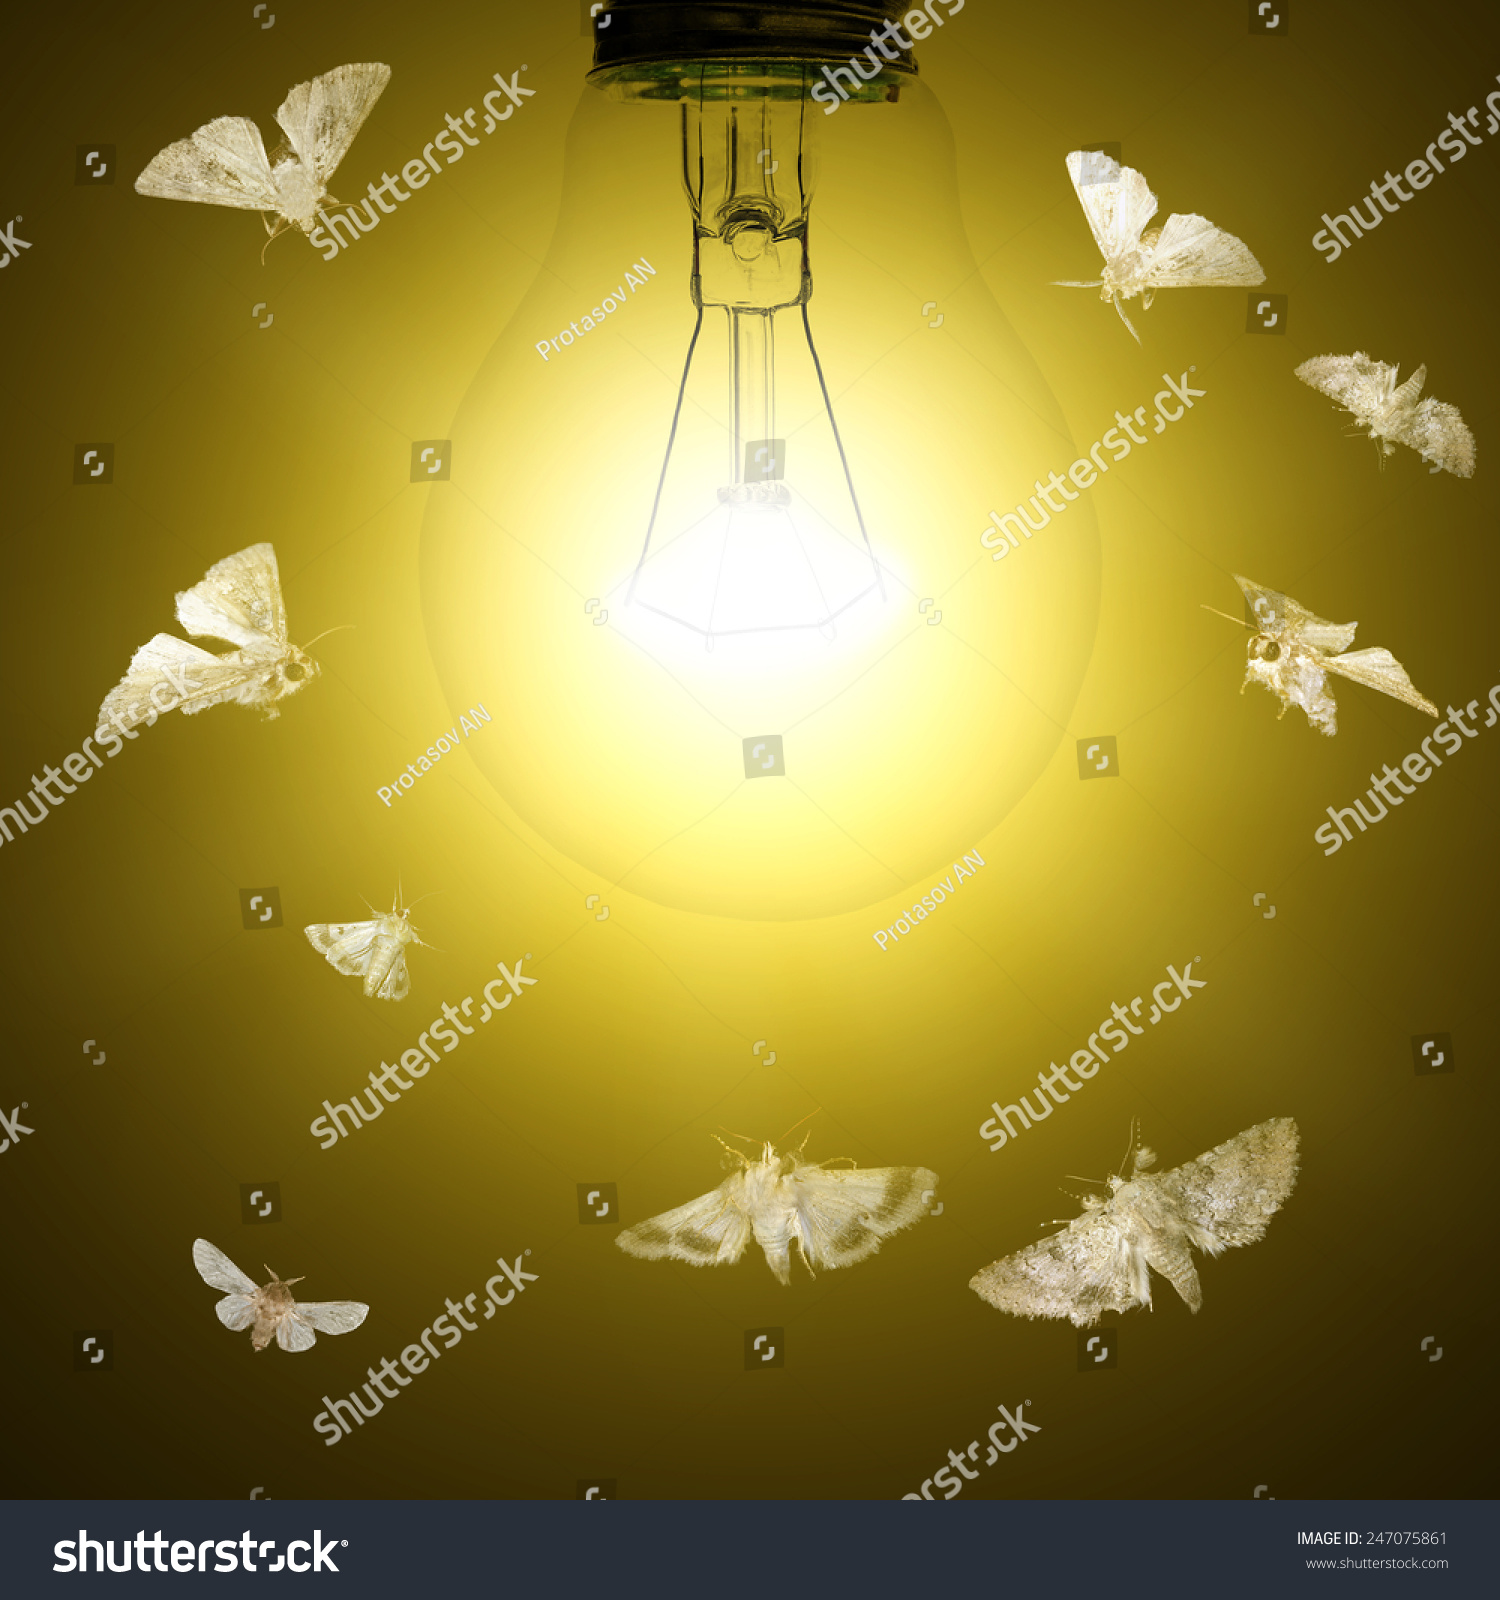 Light Bulb Moths Flying Around Stock Photo 247075861 - Shutterstock:Light bulb and moths flying around,Lighting